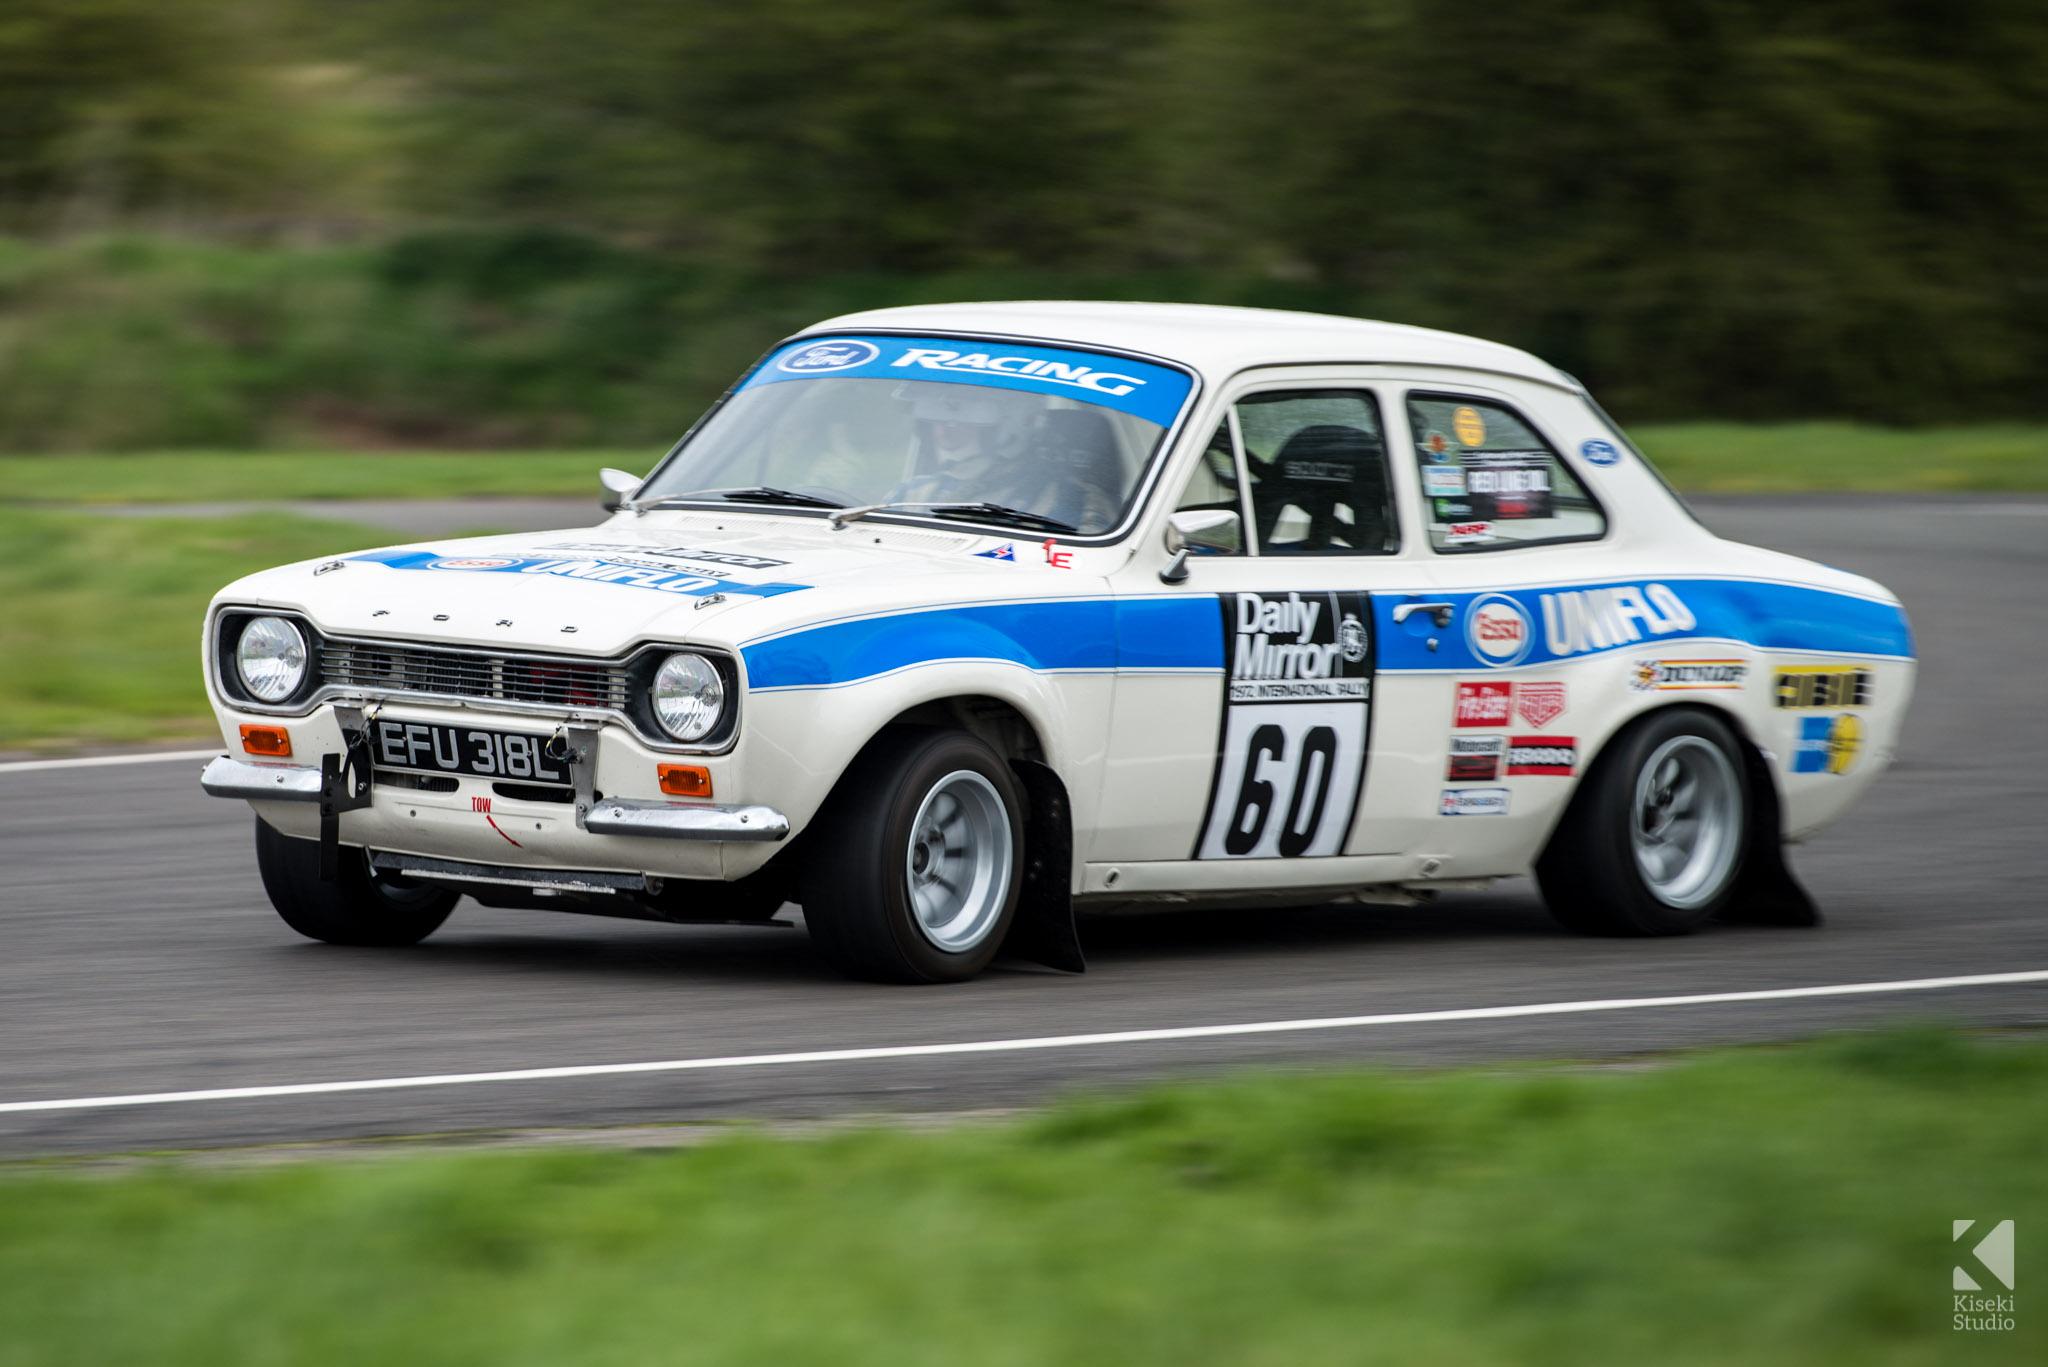 ford-escort-mk1-classic-rally-racing-curborough-sprint-course